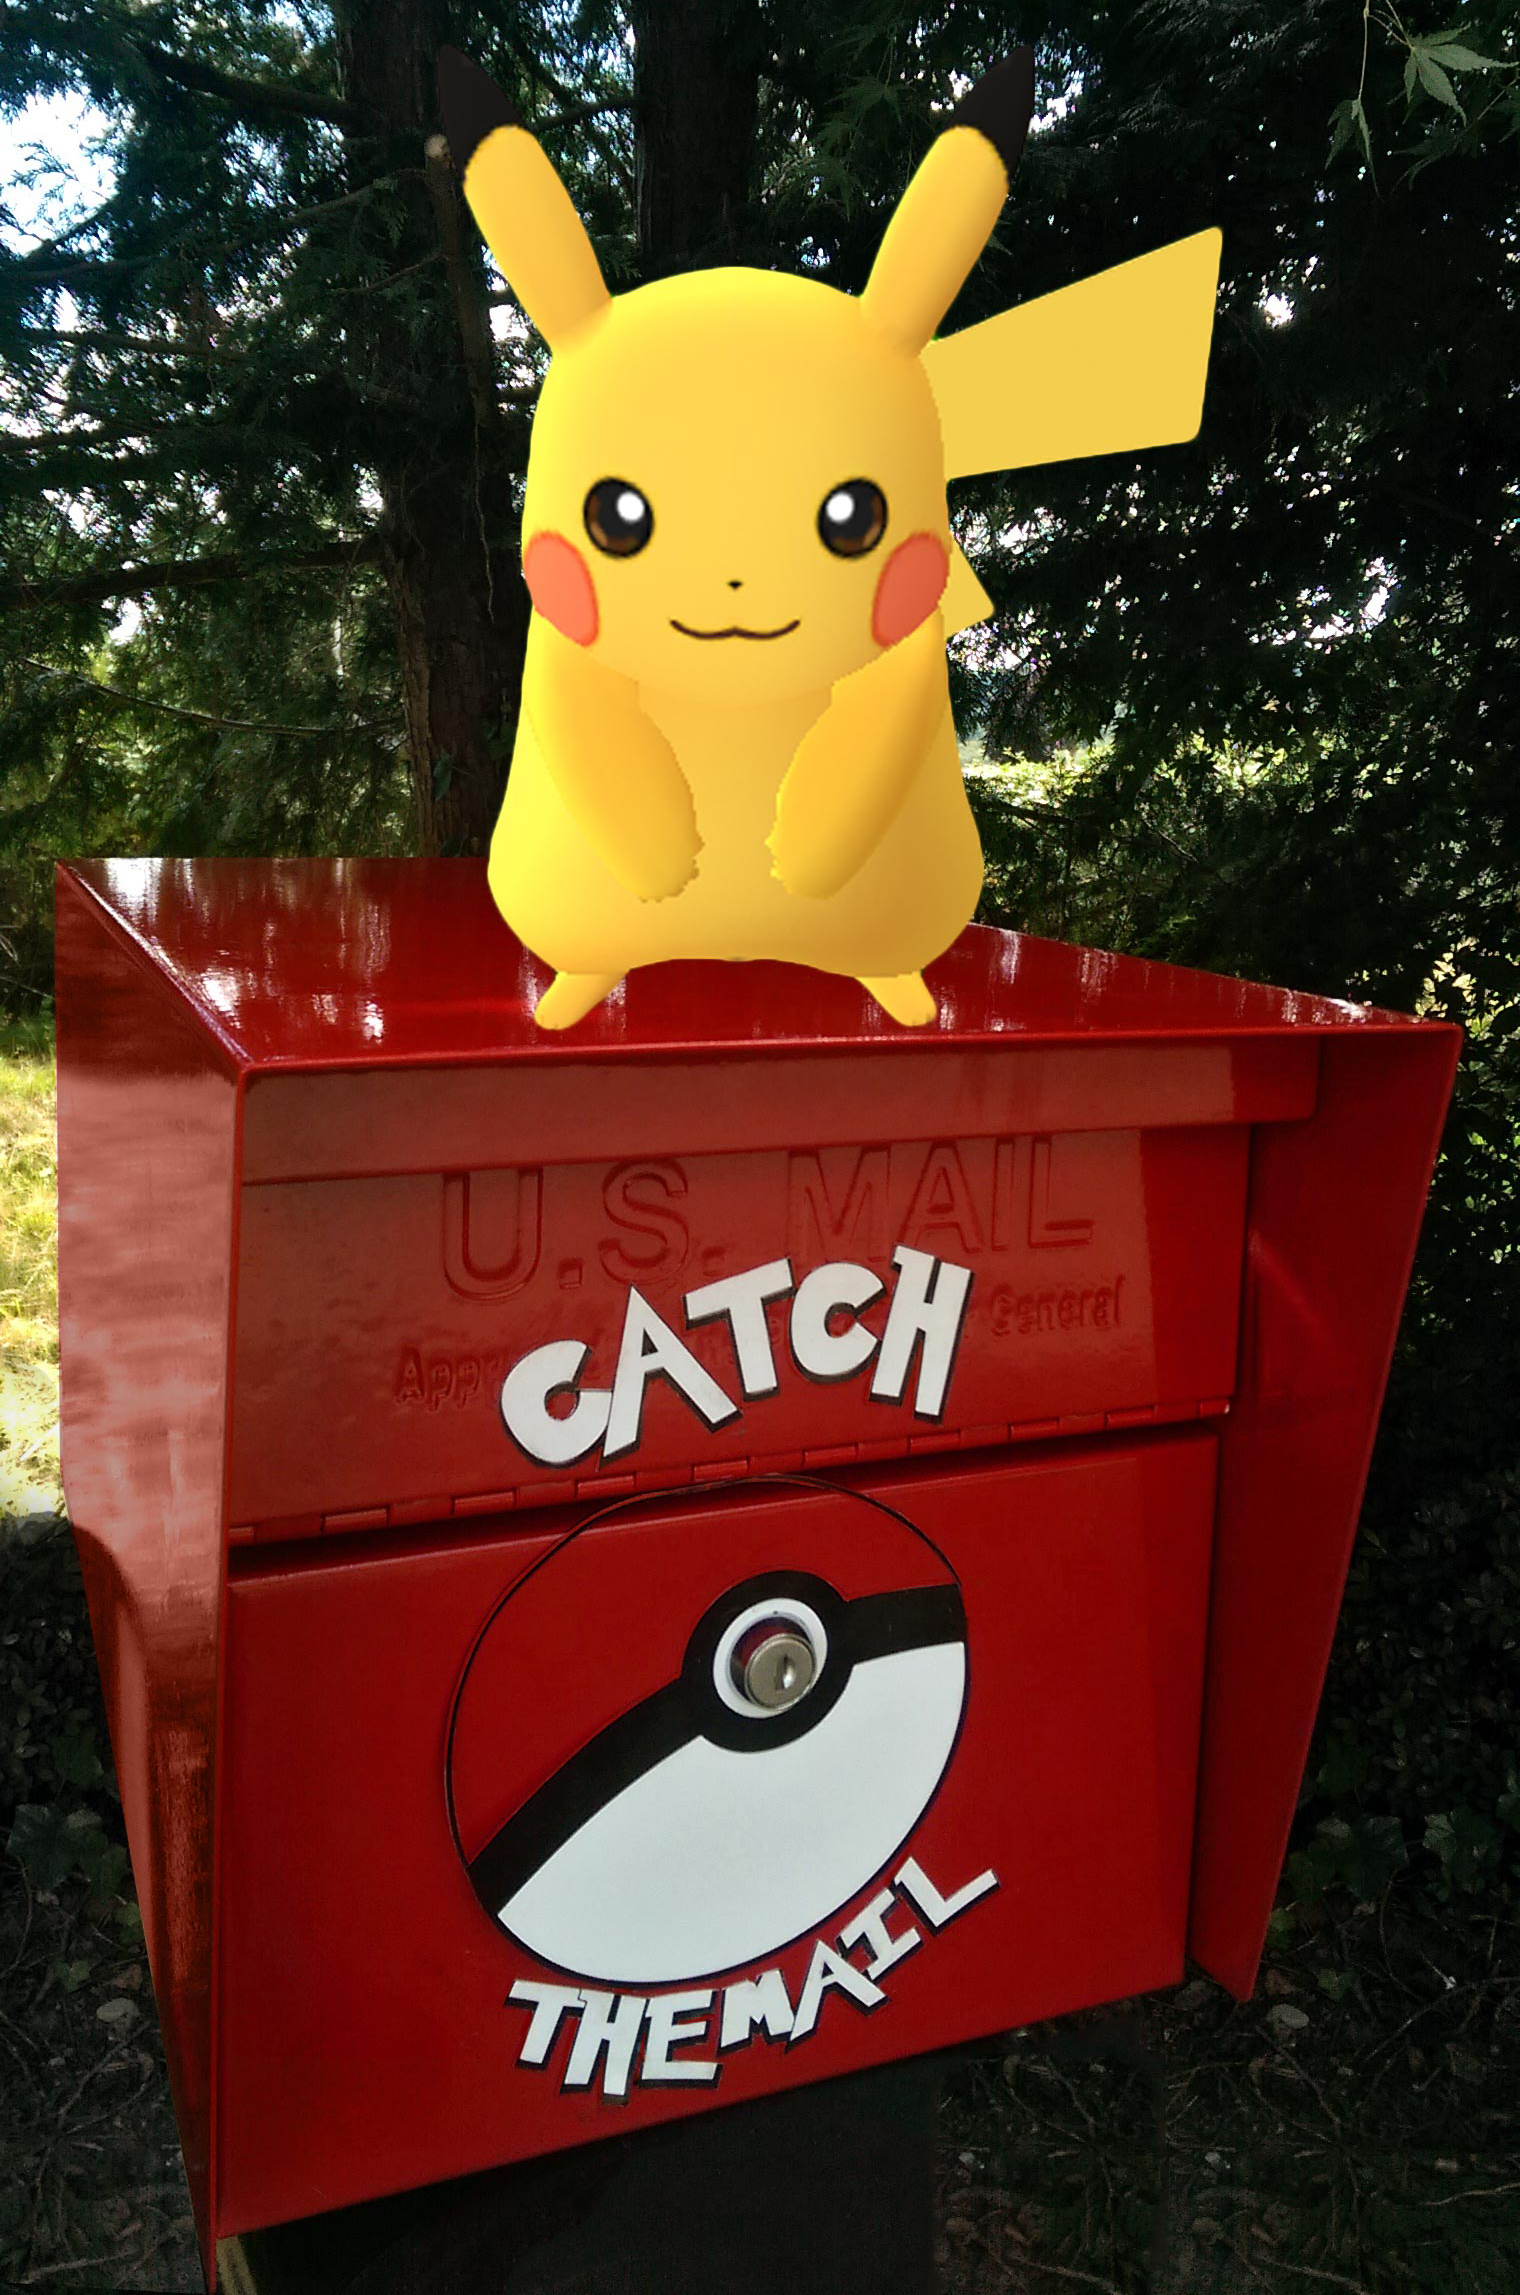 Pokeman Mailbox Catch the Mail Catch them All